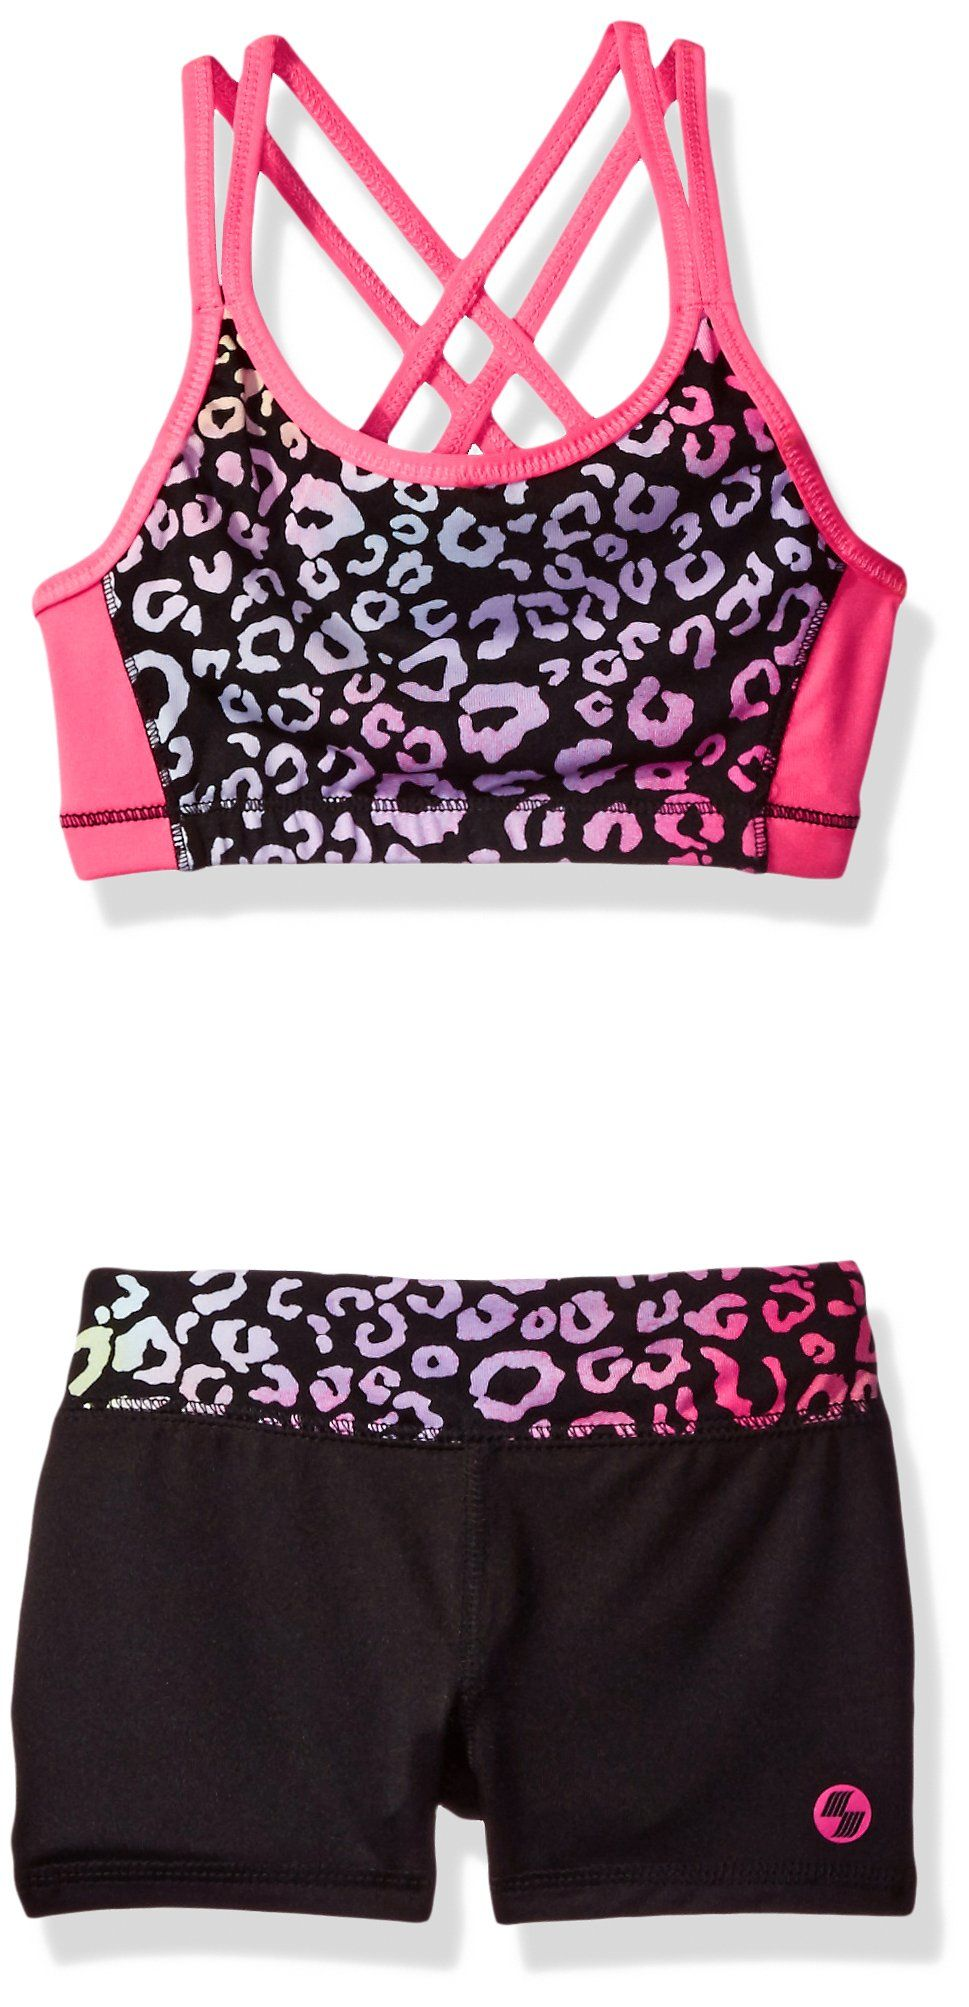 8b8ce2e42c The Children s Place Little Girls  Sports Bra   Yoga Shorts Set ...